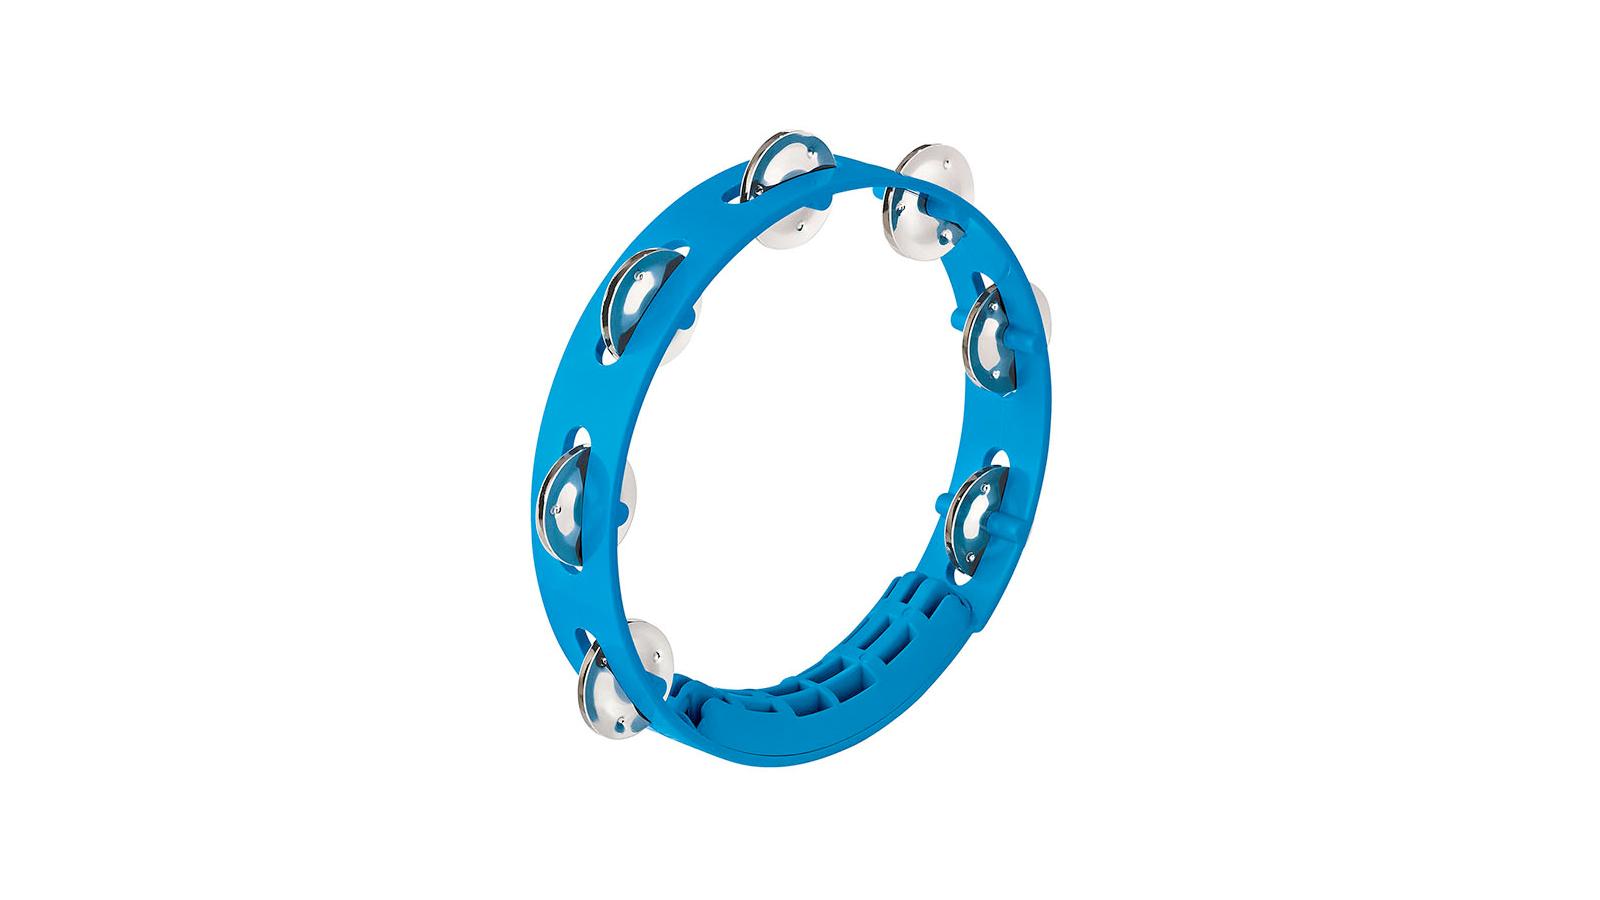 Nino Kompakt ABS Tamburin Himmelblau